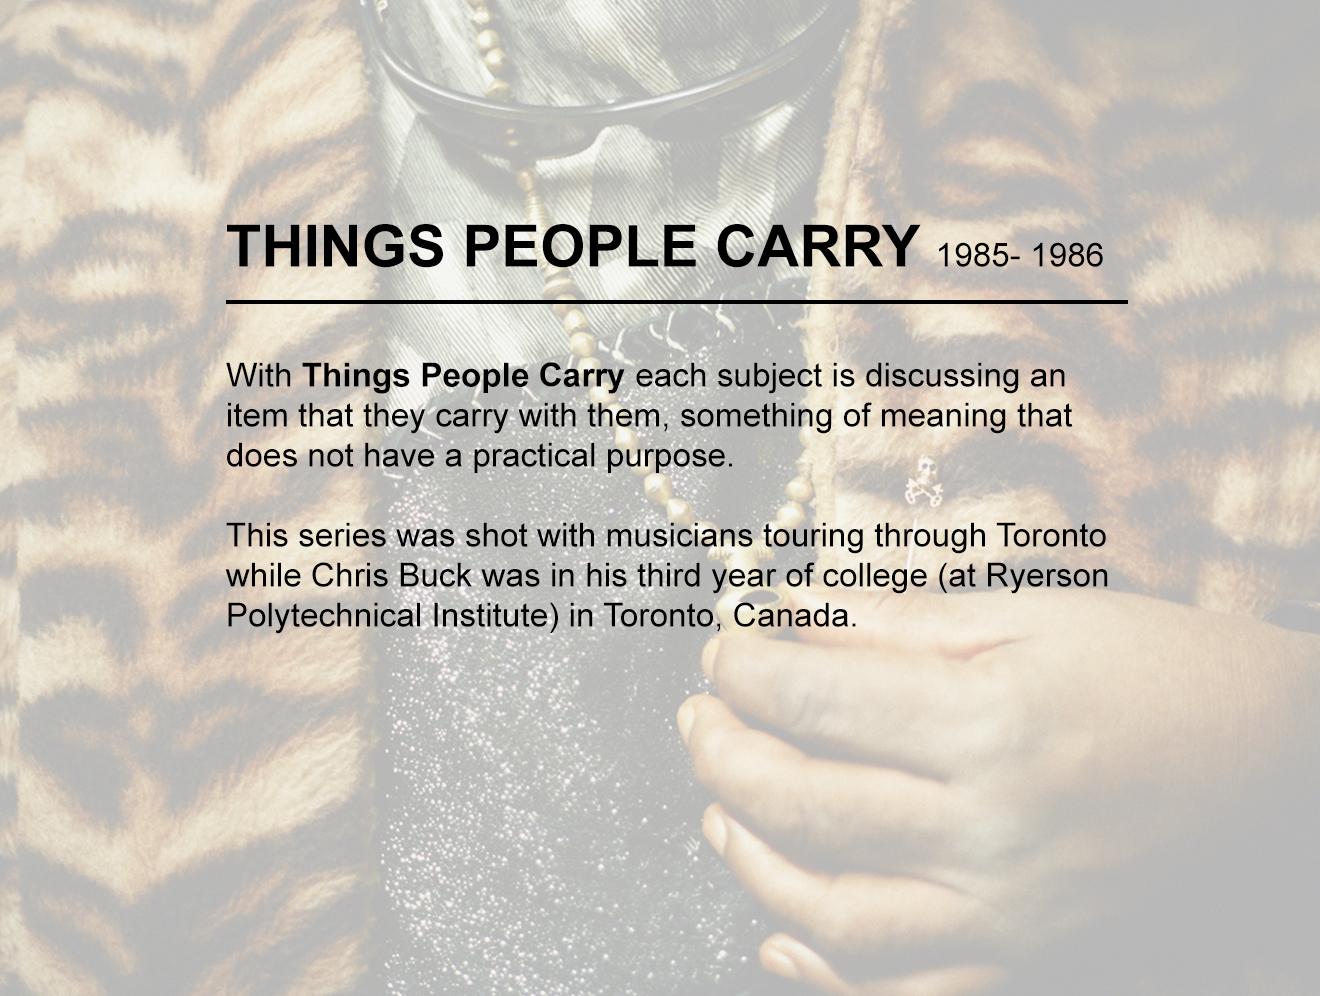 00-ThingsPeopleCarry-TitleCard.jpg